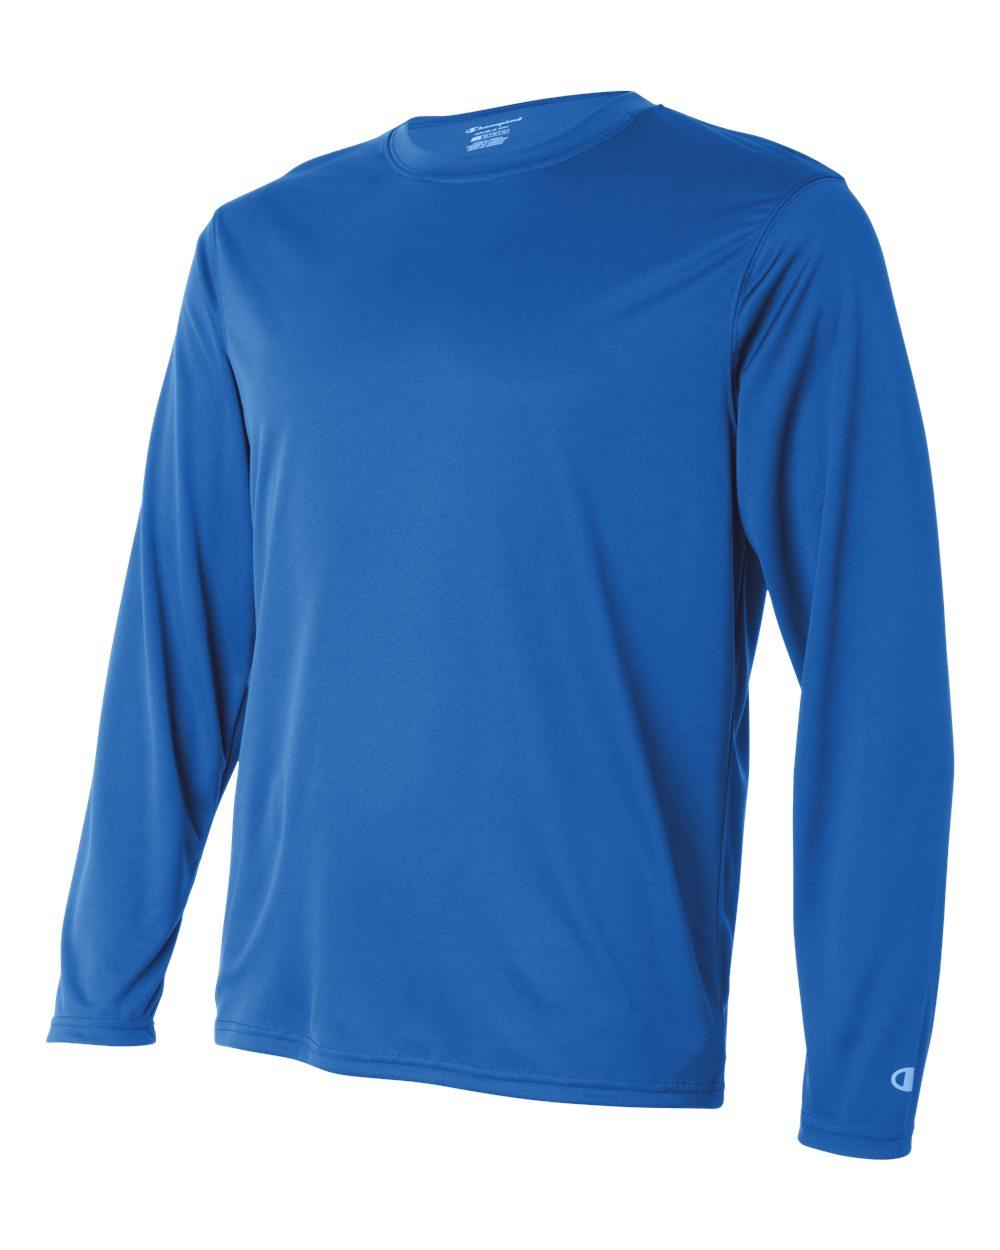 Champion-Men-039-s-Double-Dry-4-1-oz-Long-Sleeve-Interlock-T-Shirt-CW26-XS-3XL thumbnail 19